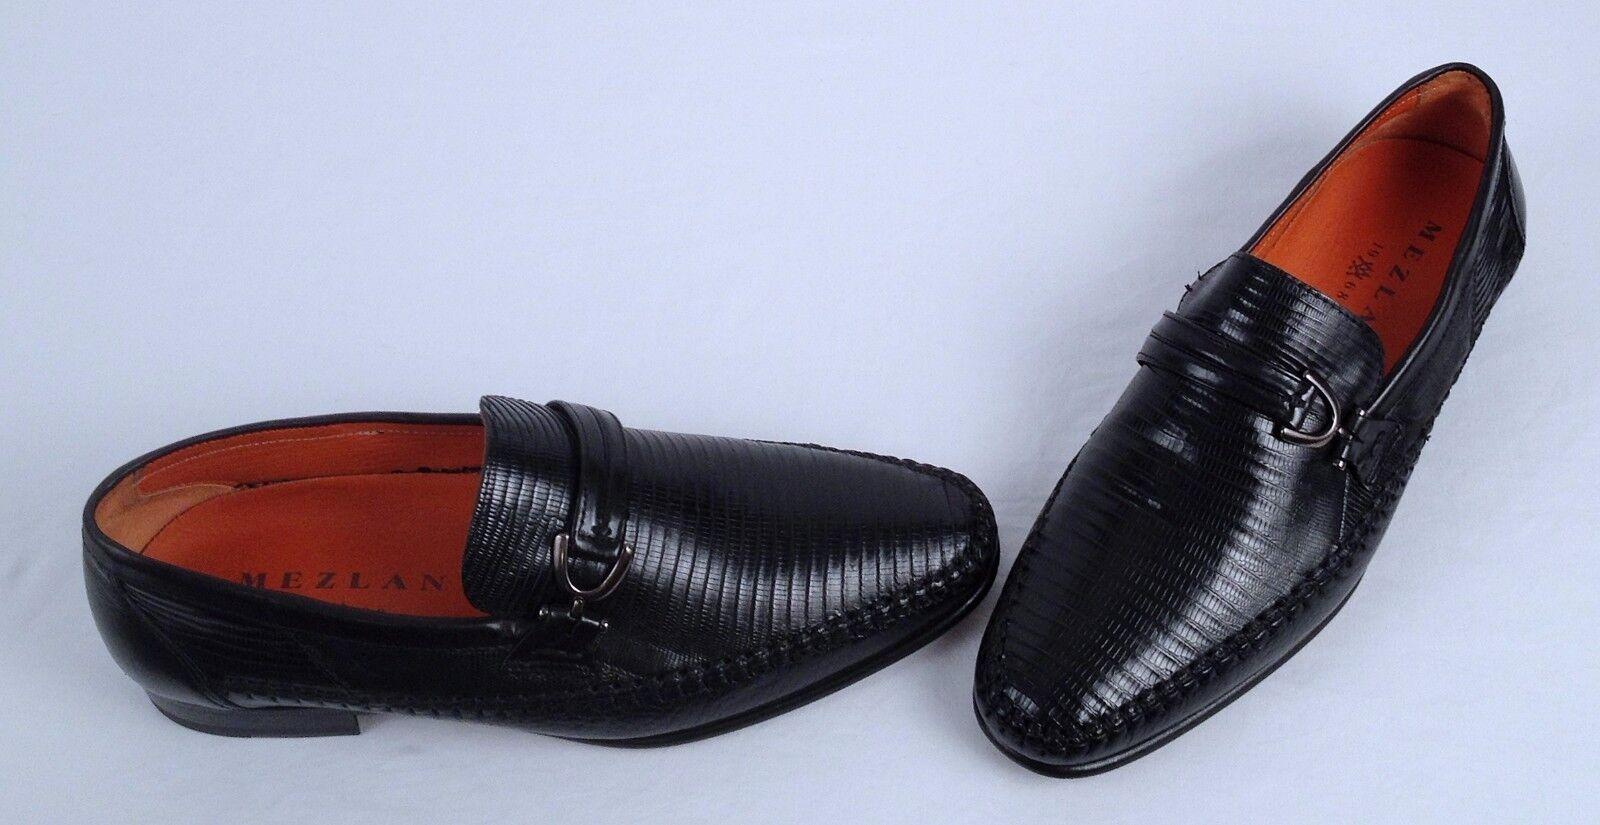 nuevo    Mezlan Lagarto Mocasín-negro-tamaño 7 m  (H5)